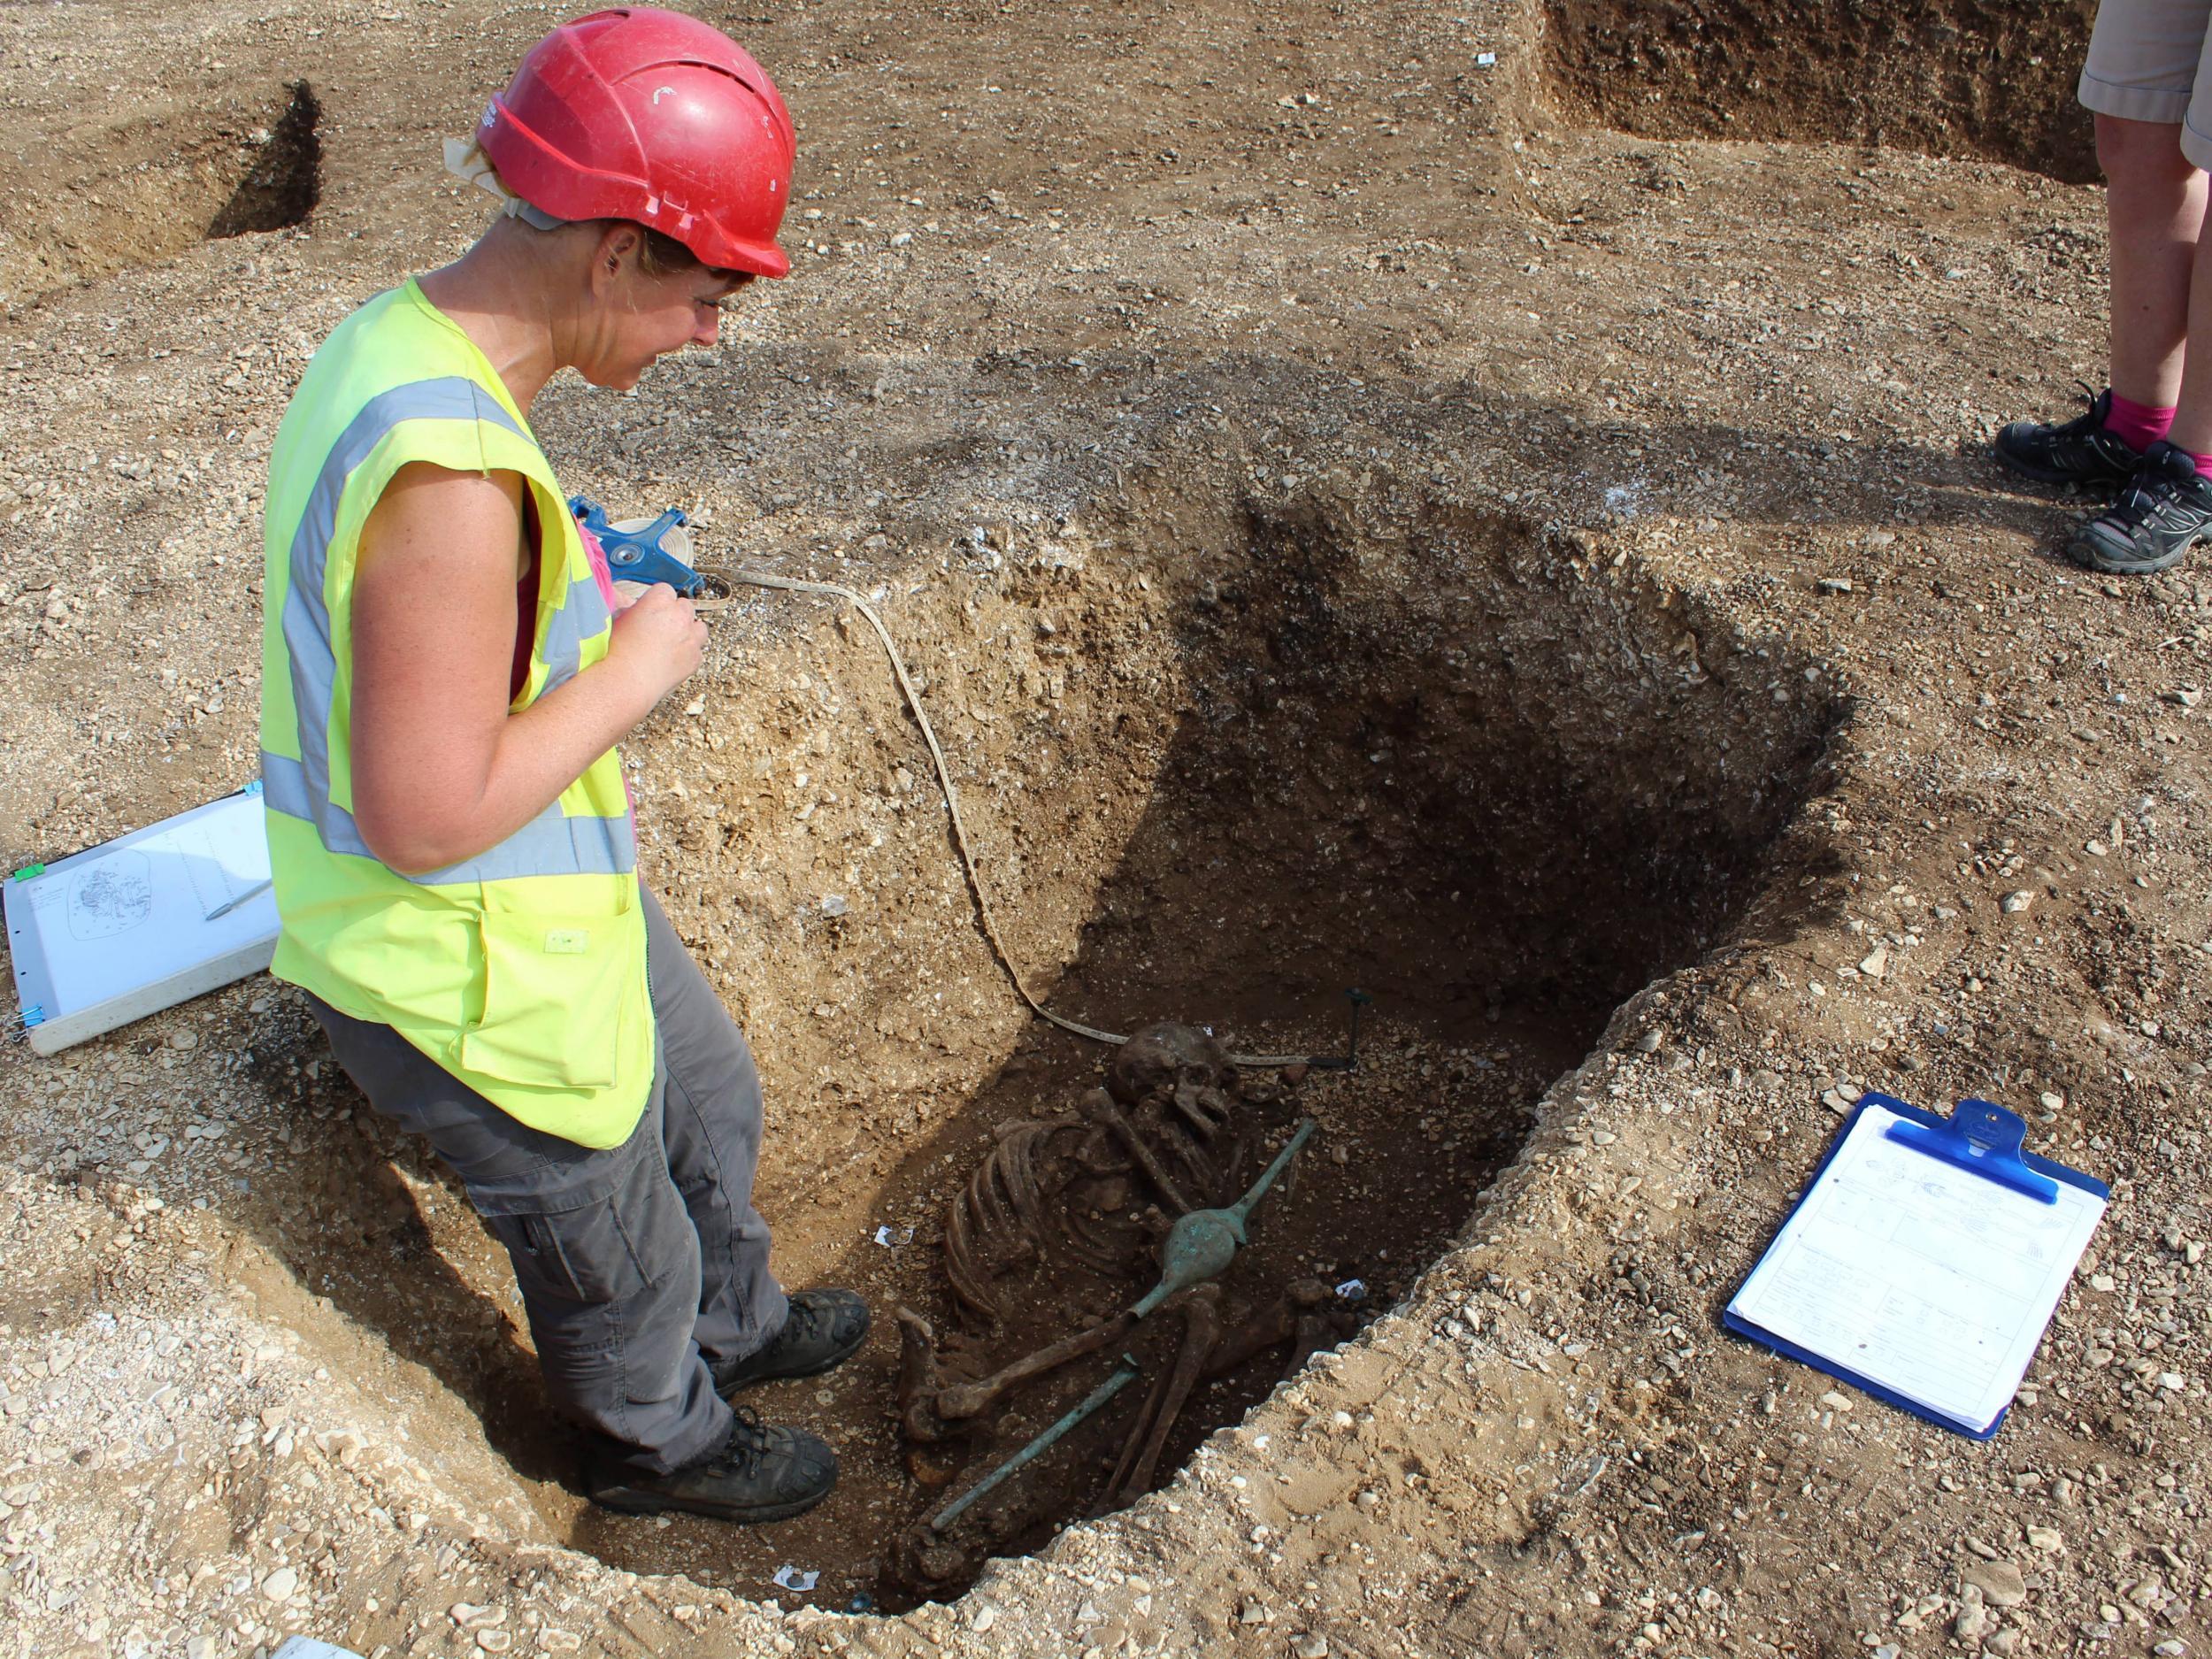 Vampire-killing ritual could explain prehistoric skeletons found in Yorkshire